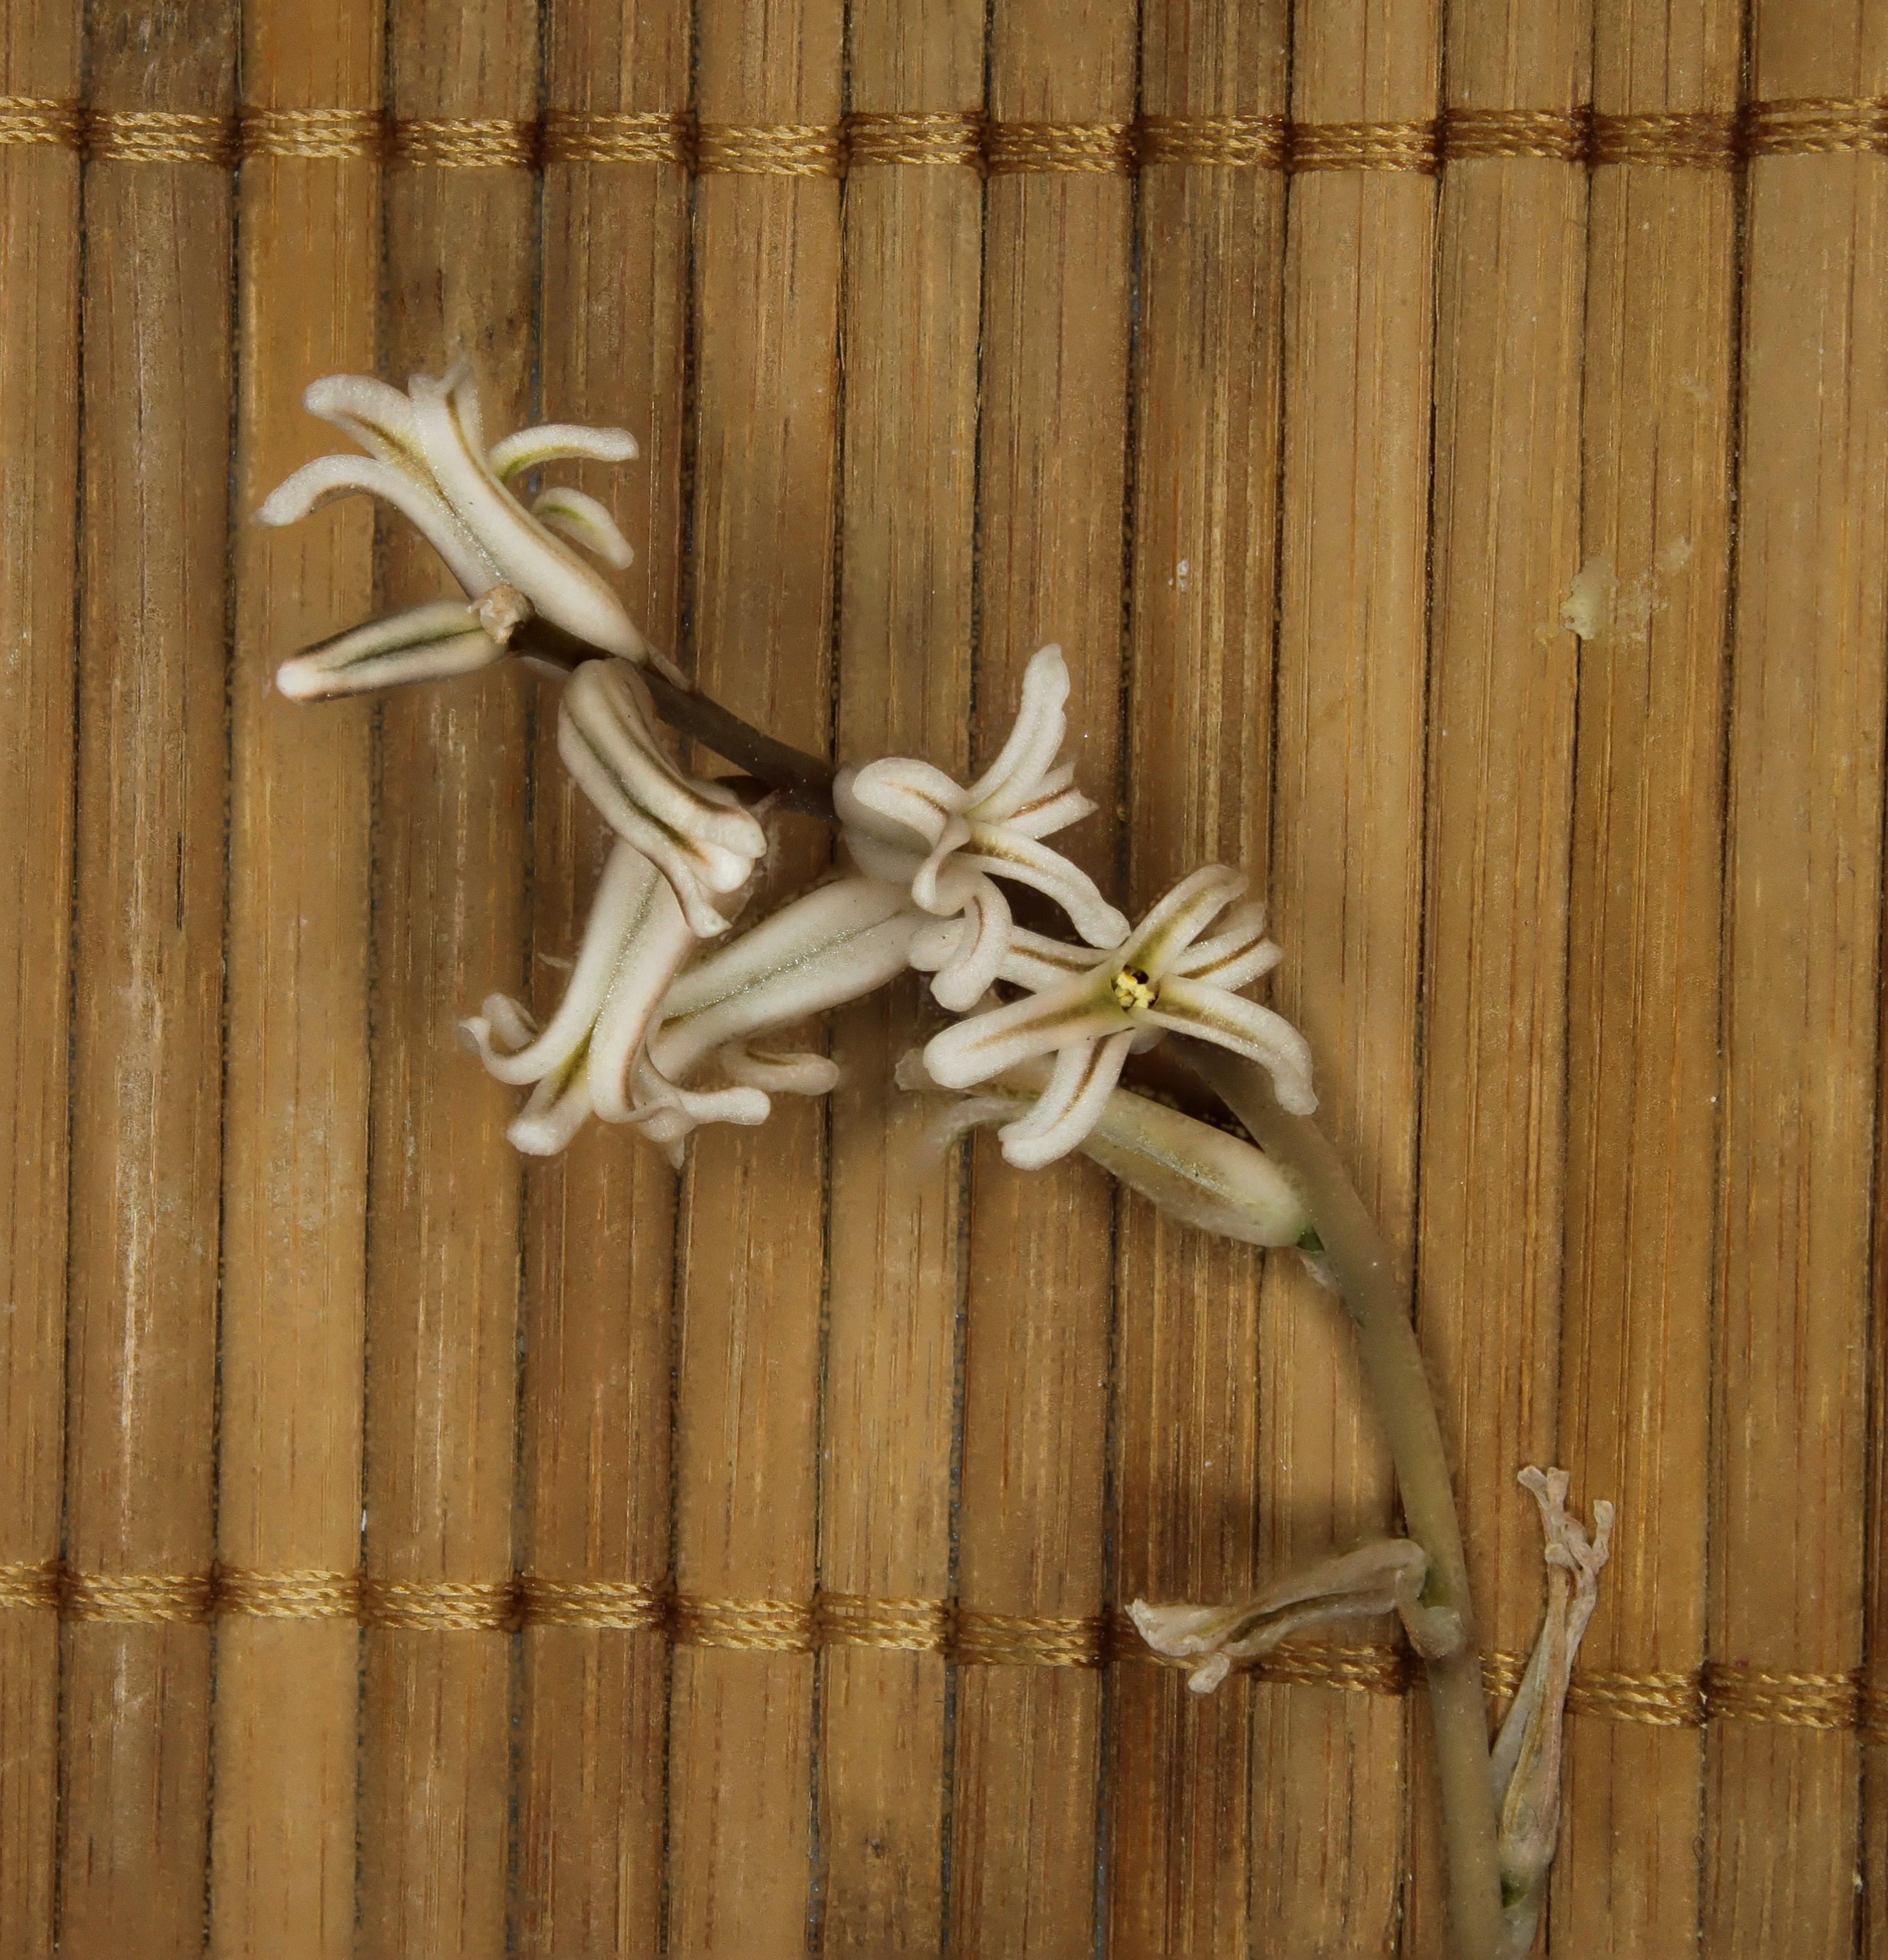 [Haworthia retusa ?] Un Haworthia ? Quatre boutons floraux en cours... 443321Haworthiafleurs